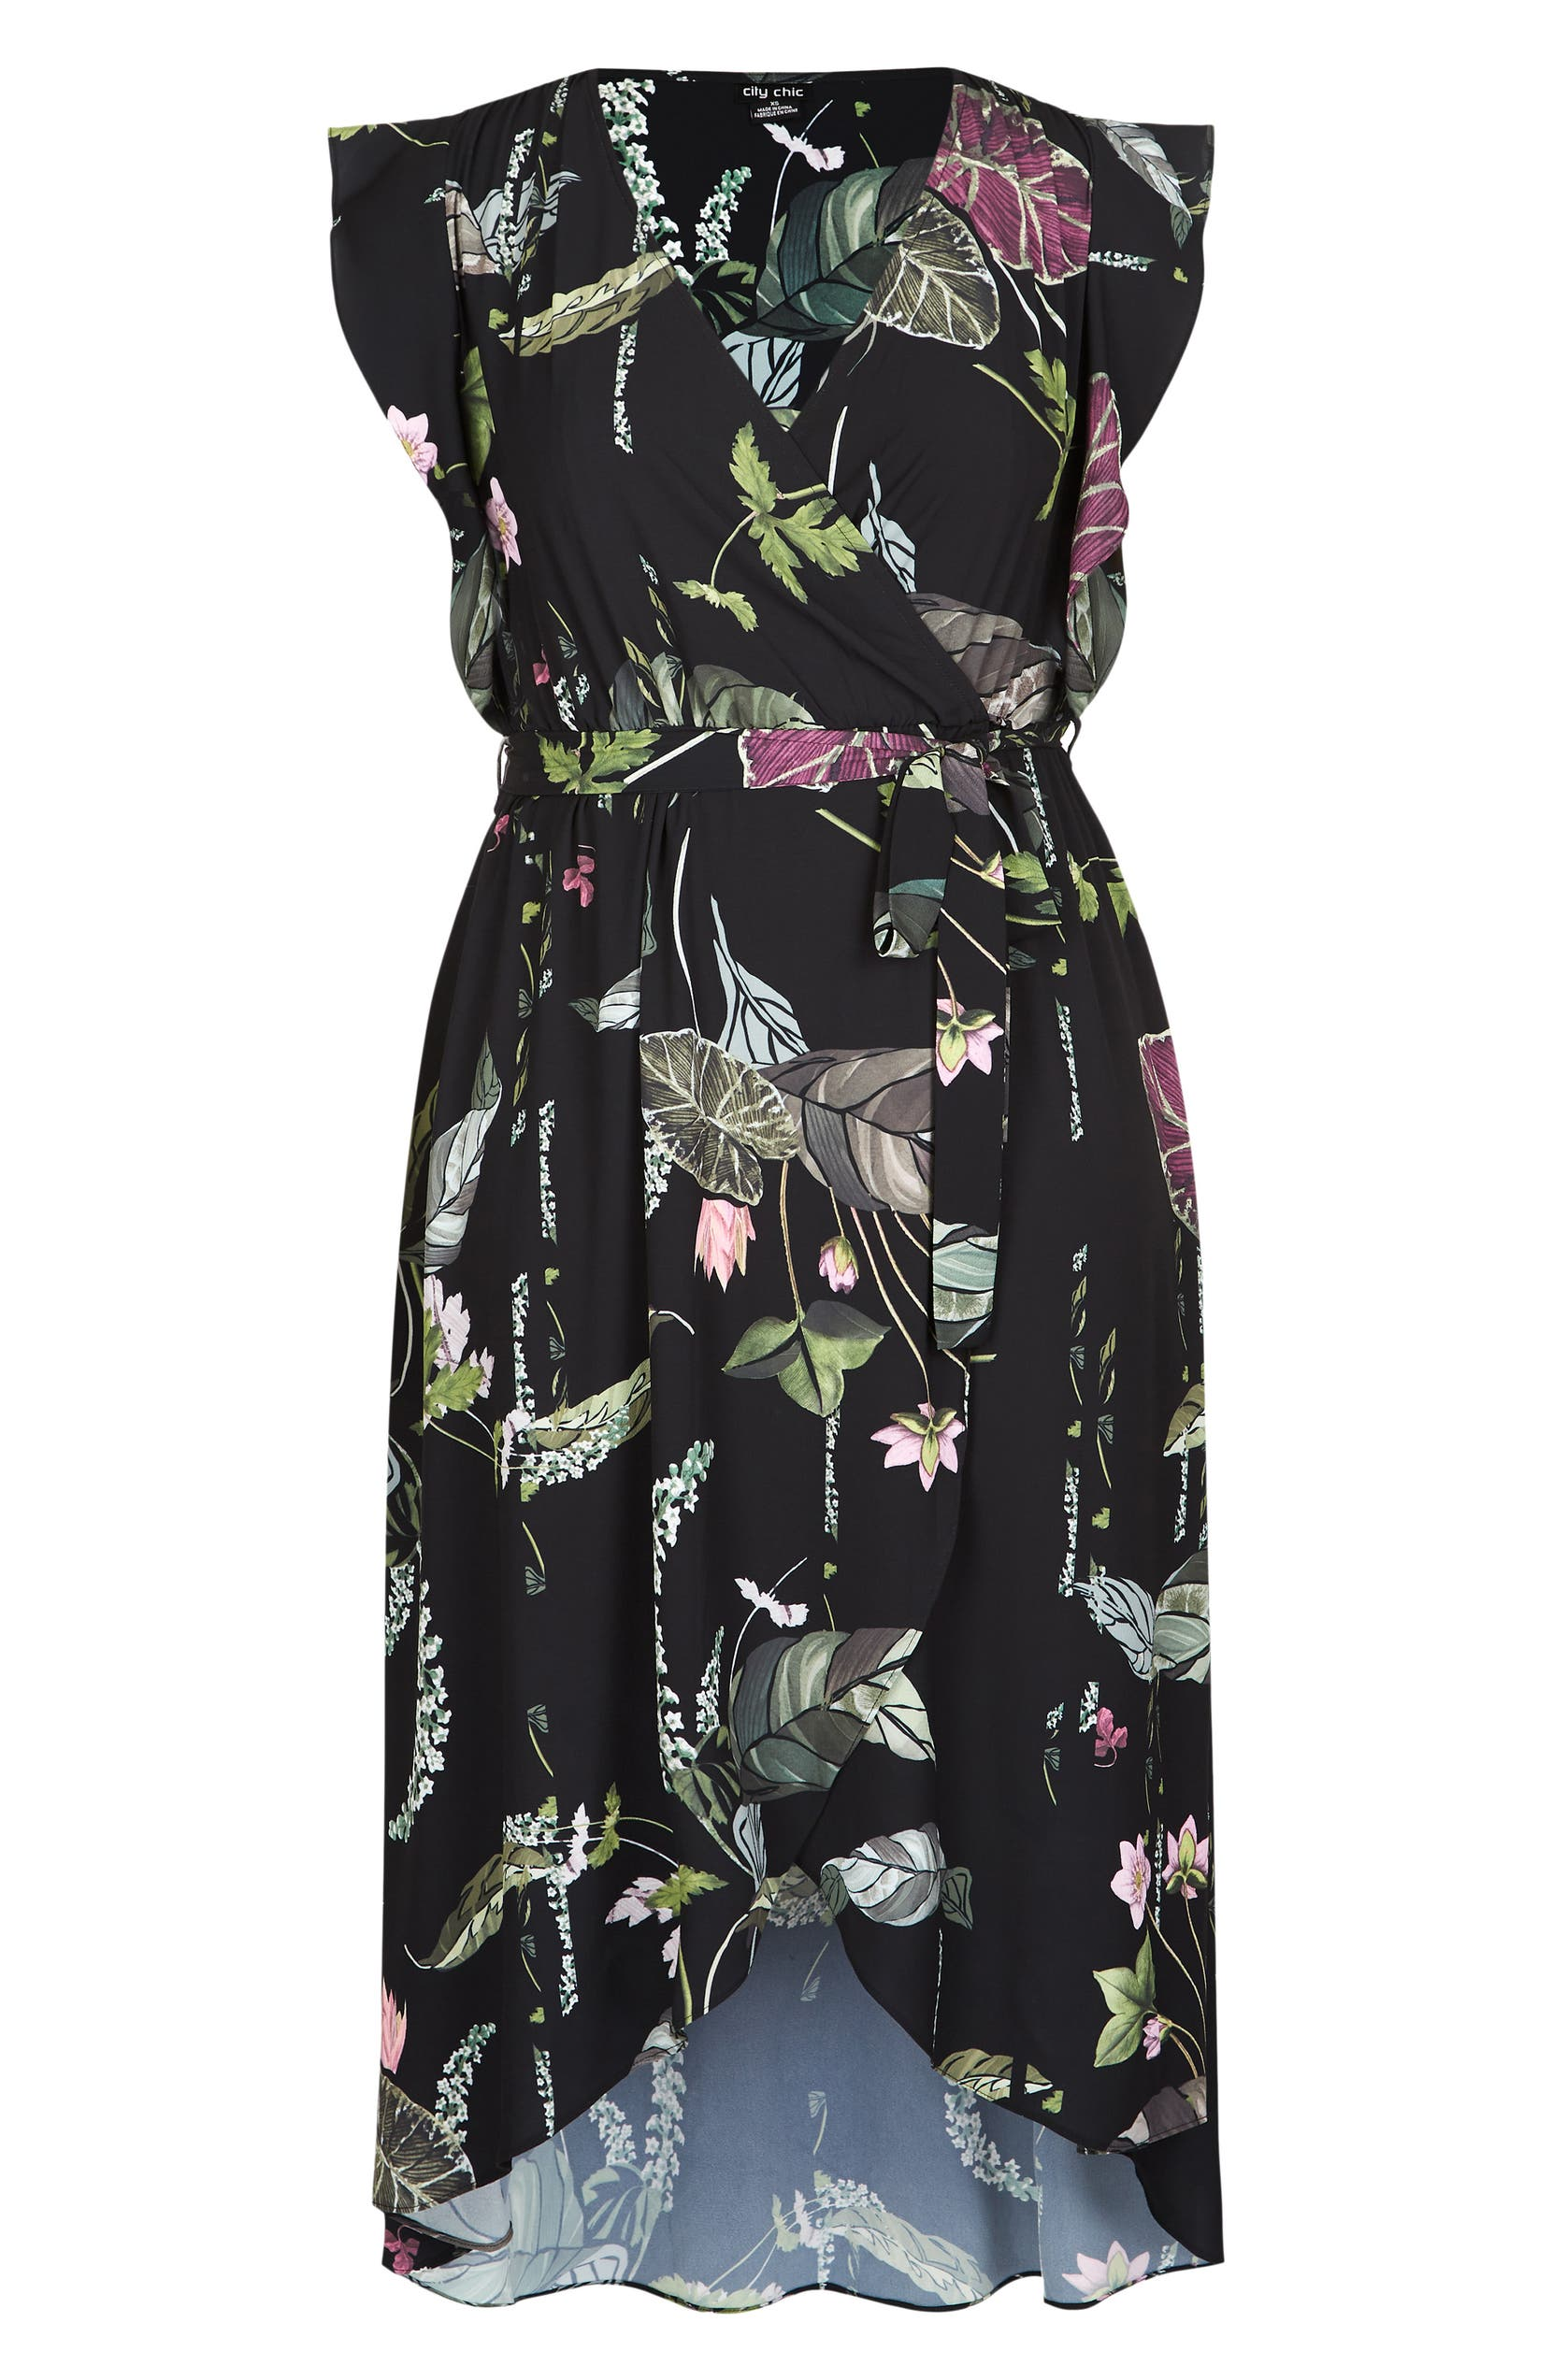 be61959a67c City Chic Lily Pad Faux Wrap Maxi Dress (Plus Size)